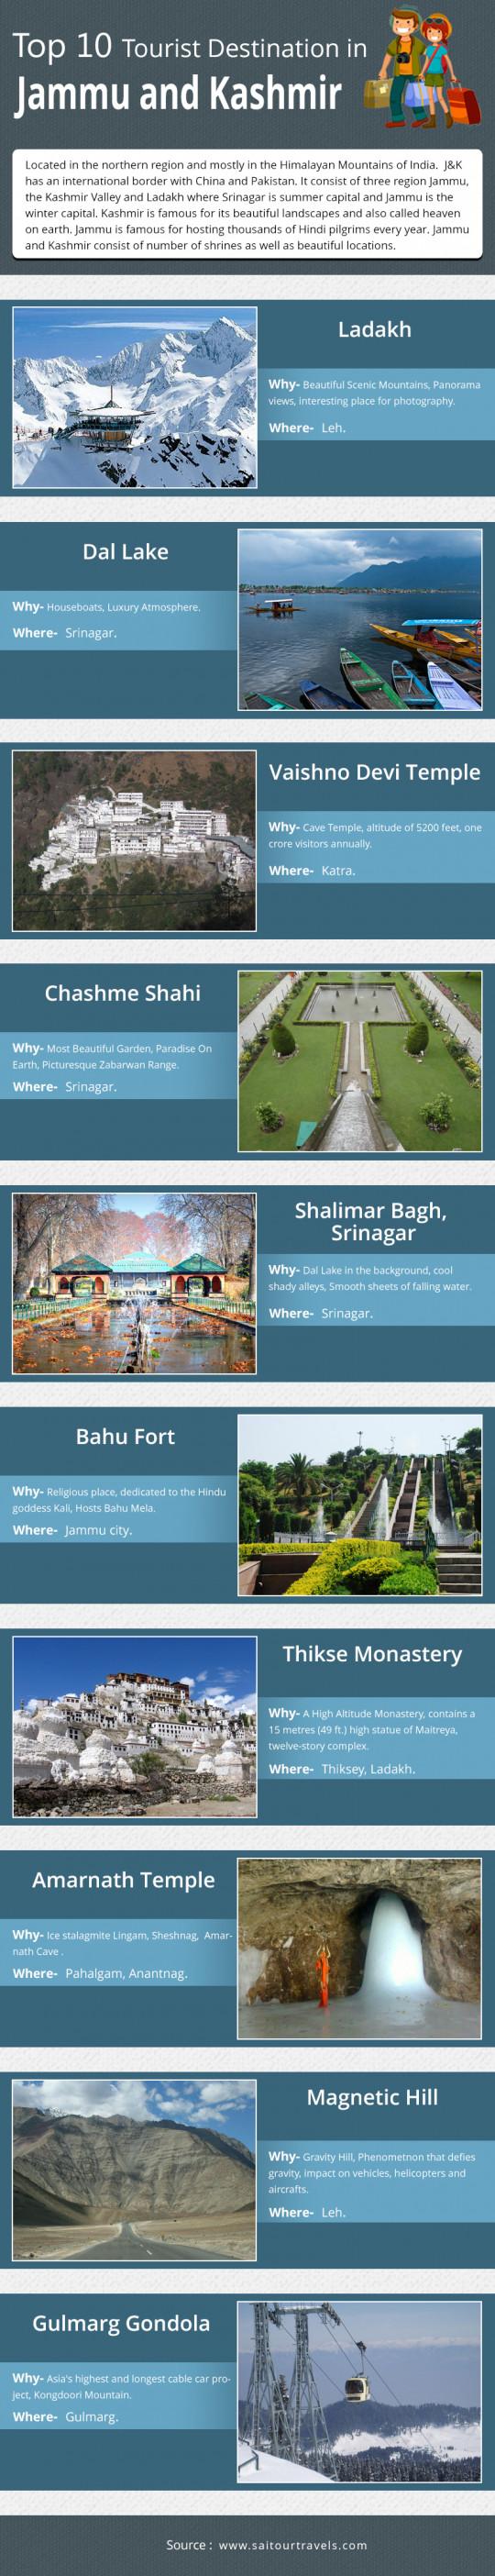 Top 10  Tourist Destinations in Jammu & Kashmir